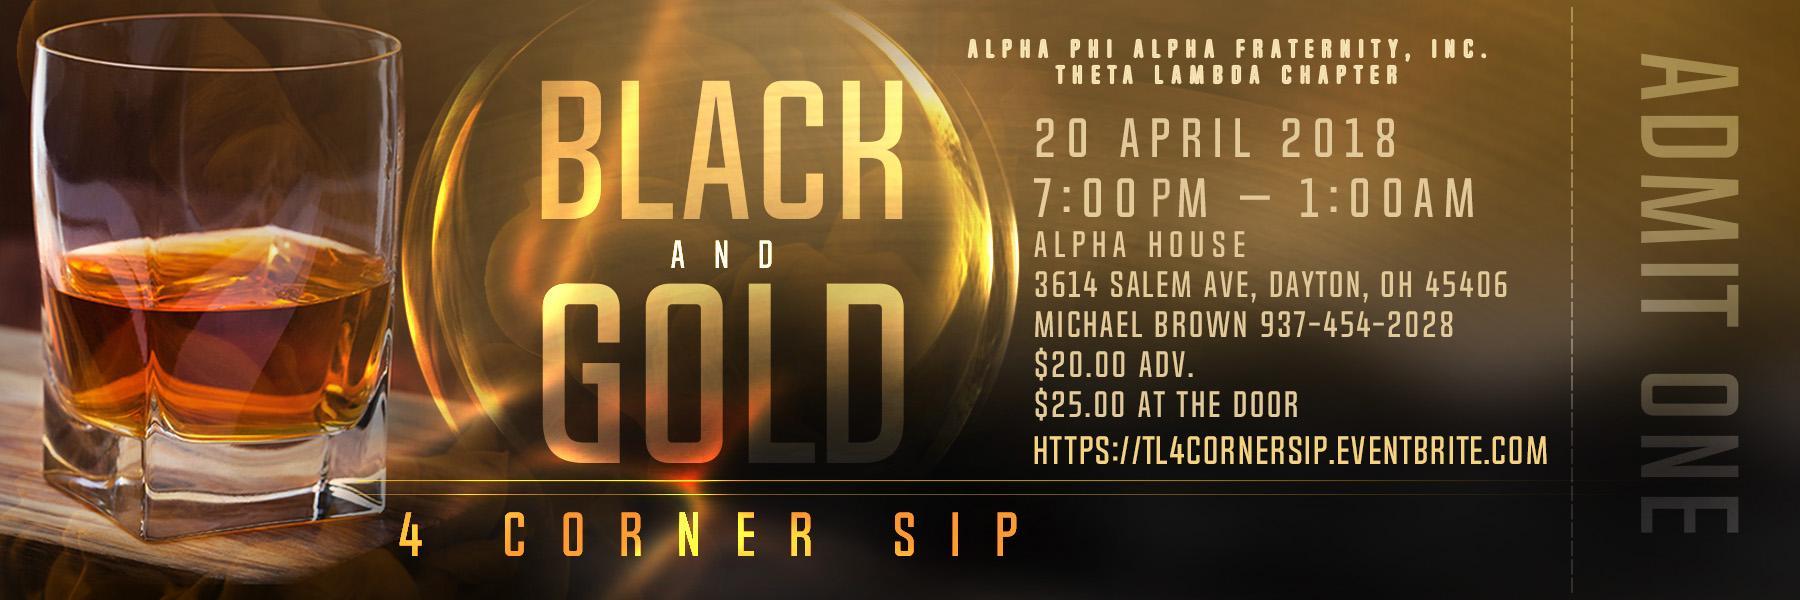 Alpha Phi Alpha Fraternity, Inc. Presents: Th